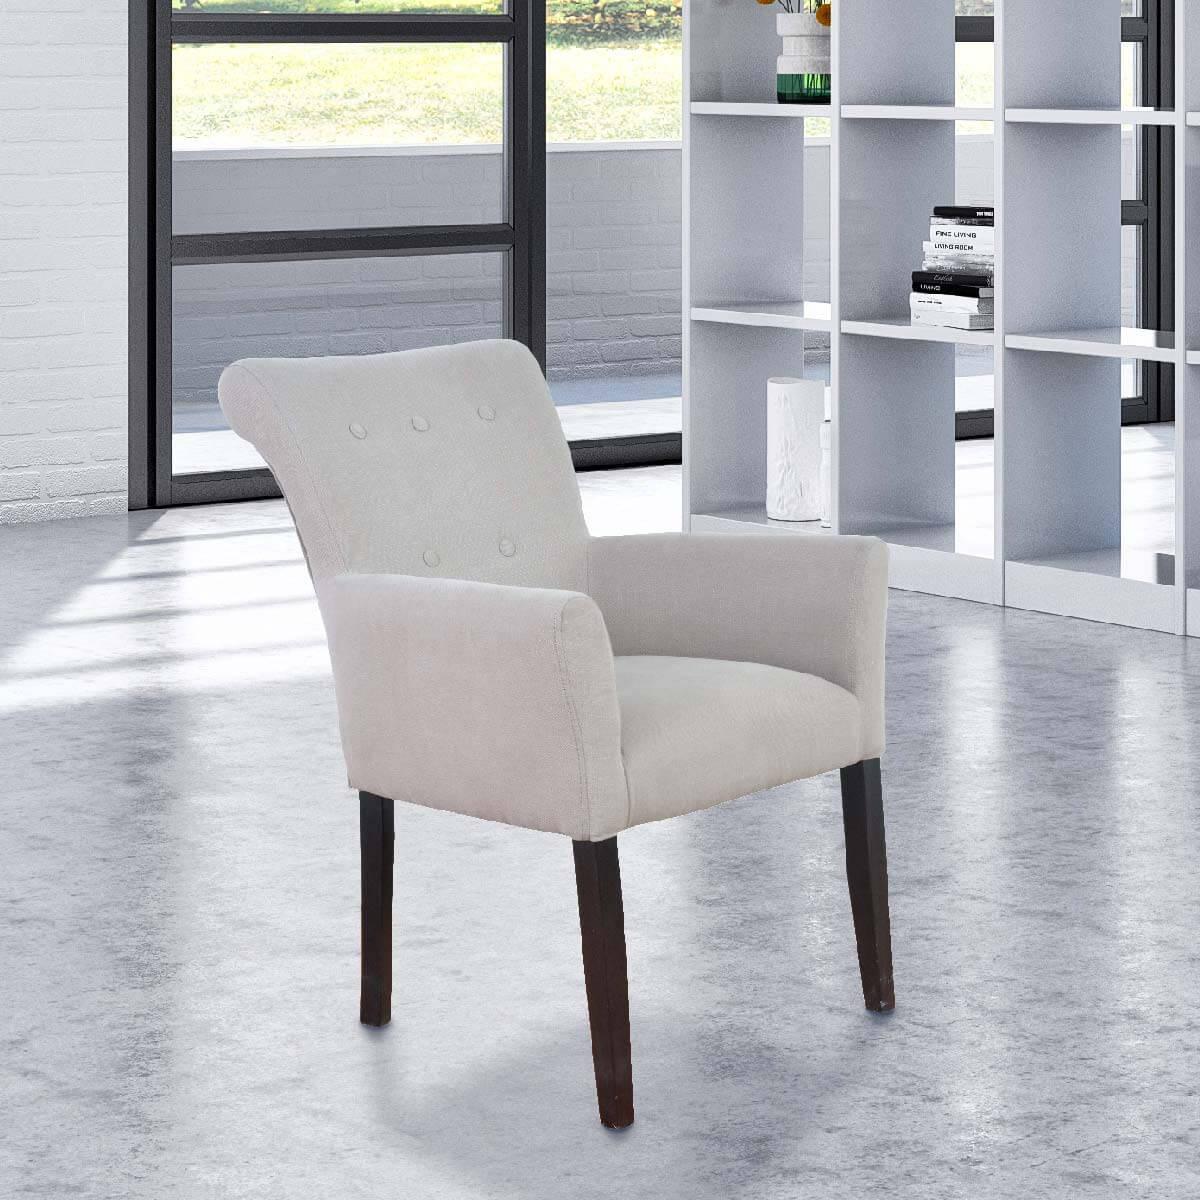 Whitley Dining Chair Cozy Home Dubai